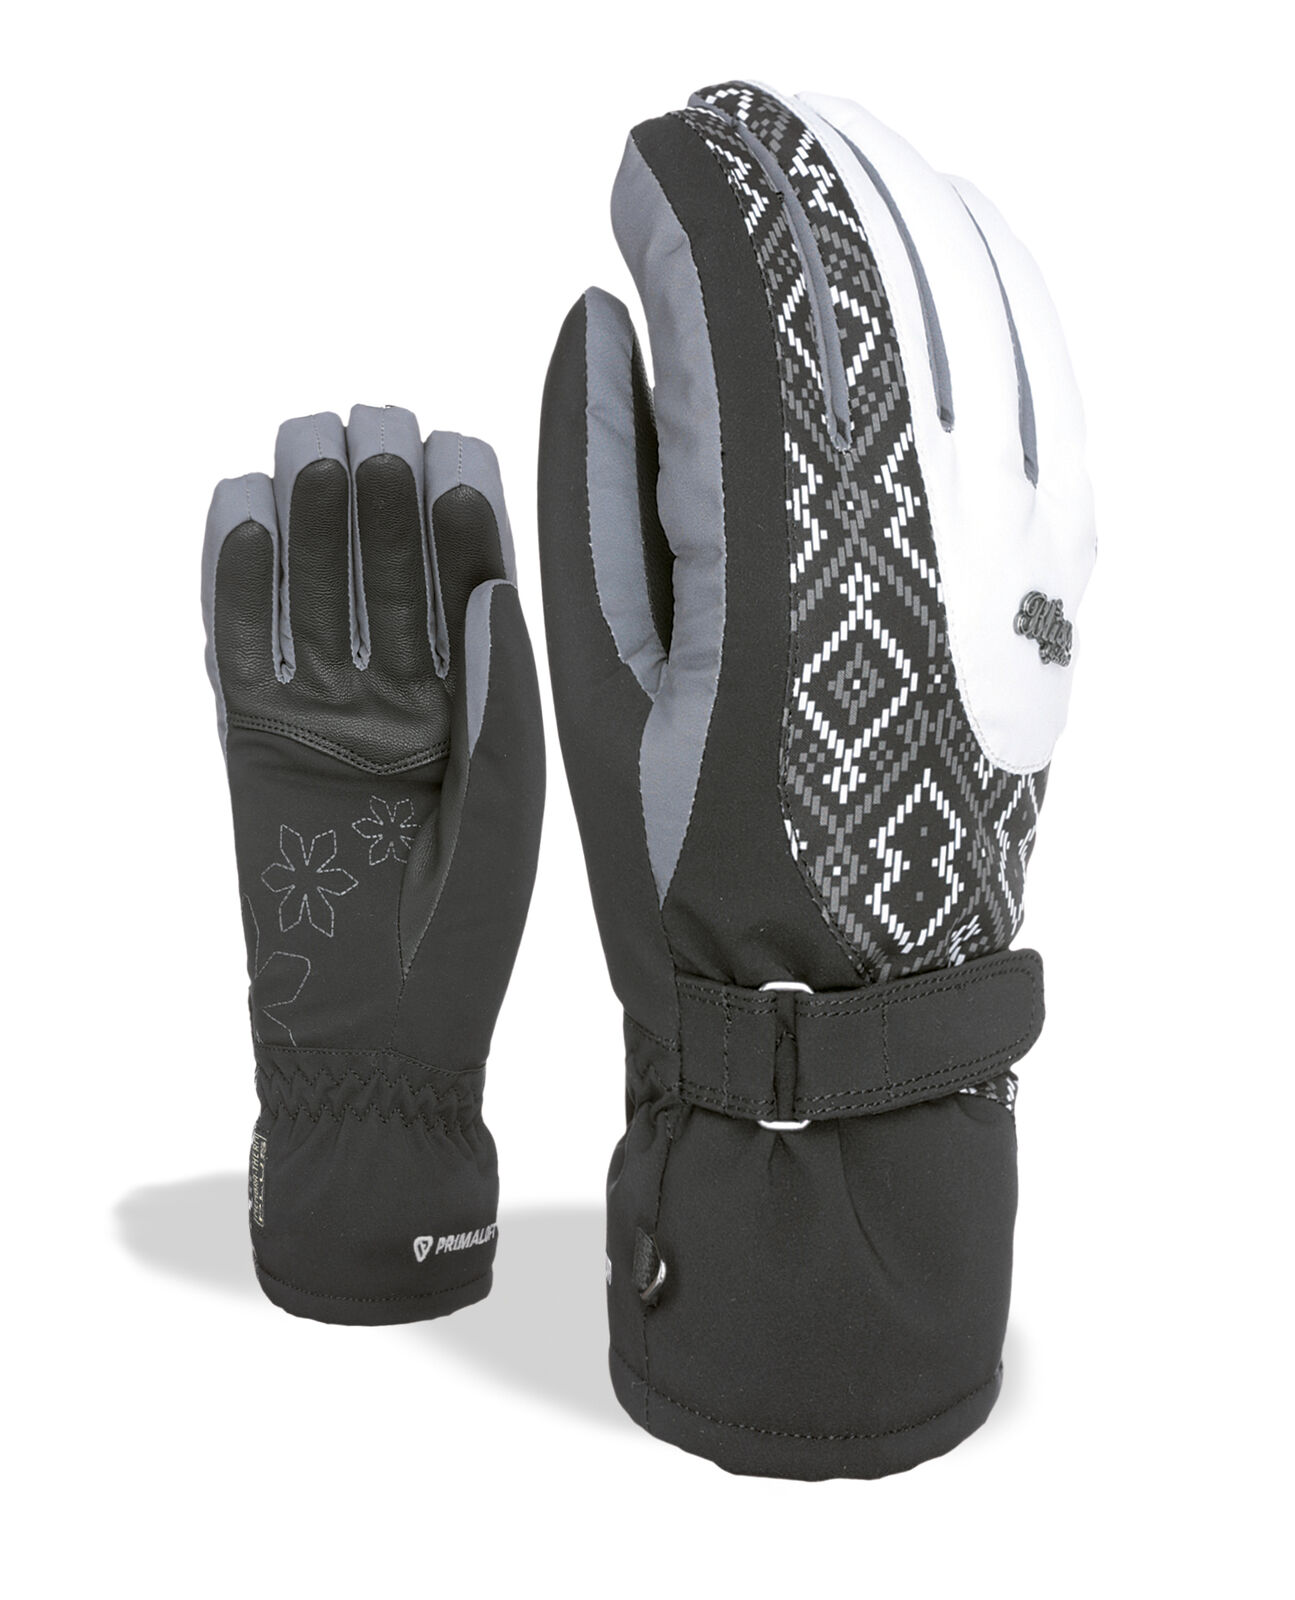 Level Handschuh  Bliss Venus black wasserdicht atmungsaktiv wärmend  wholesale store